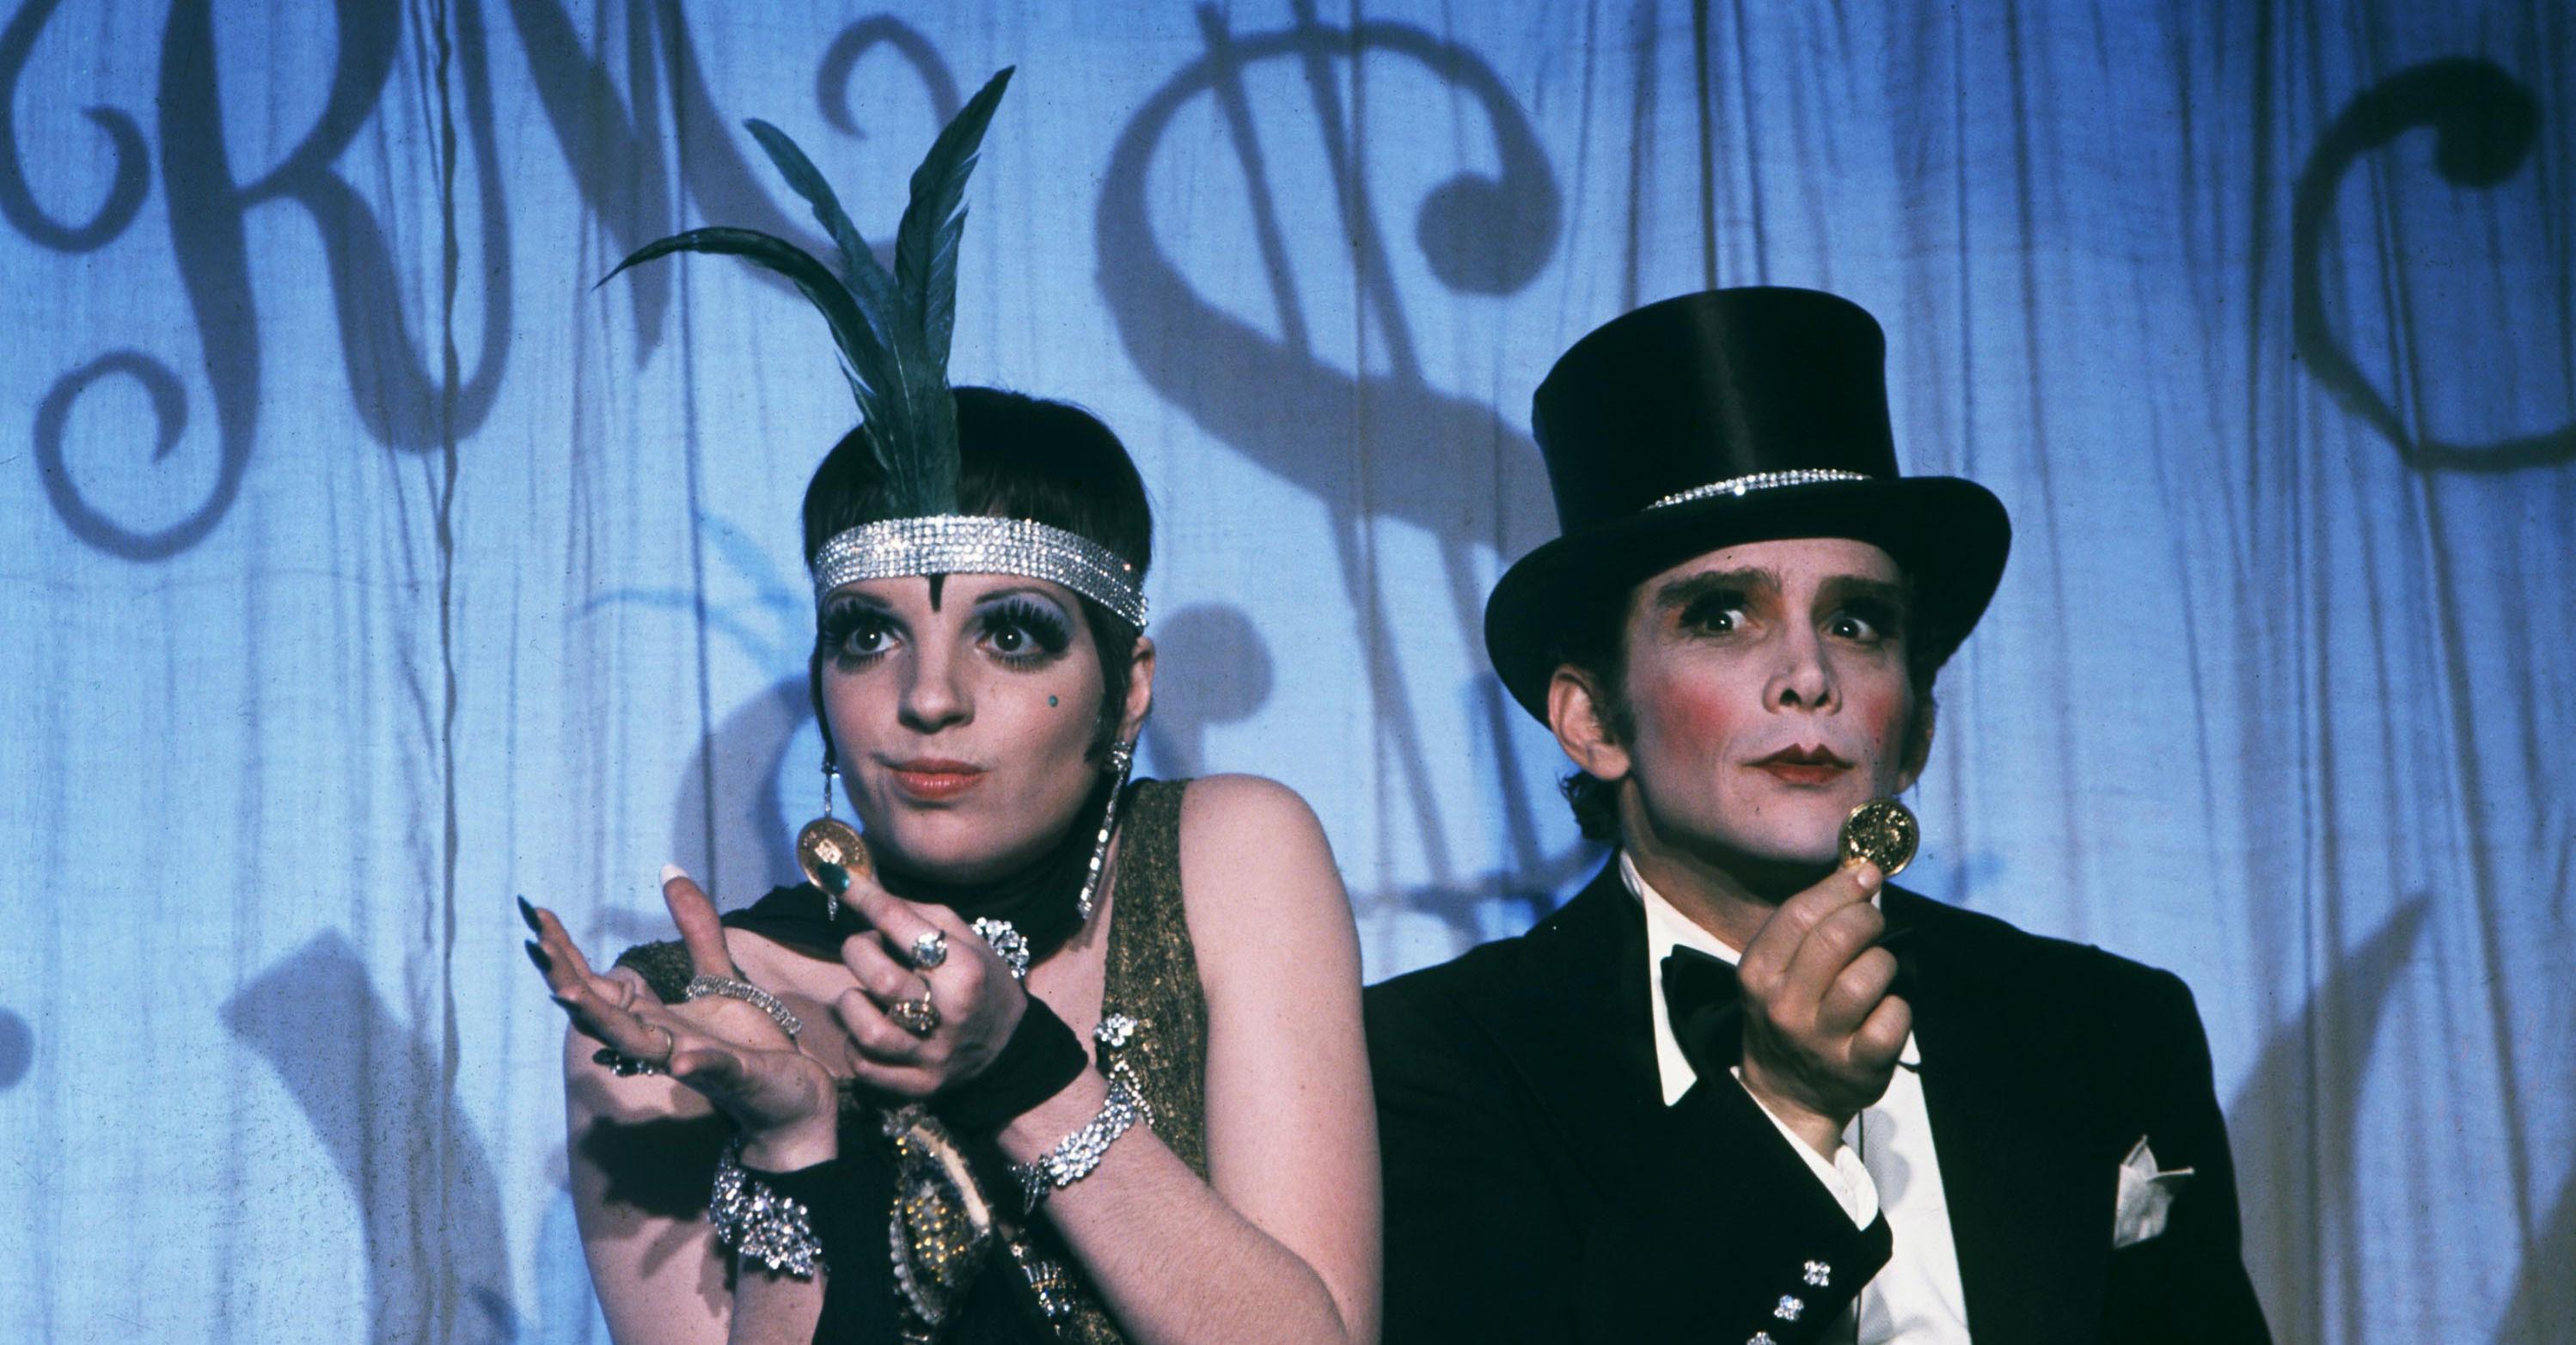 Liza Minnelli and Joel Grey star in 'Cabaret' (1972)